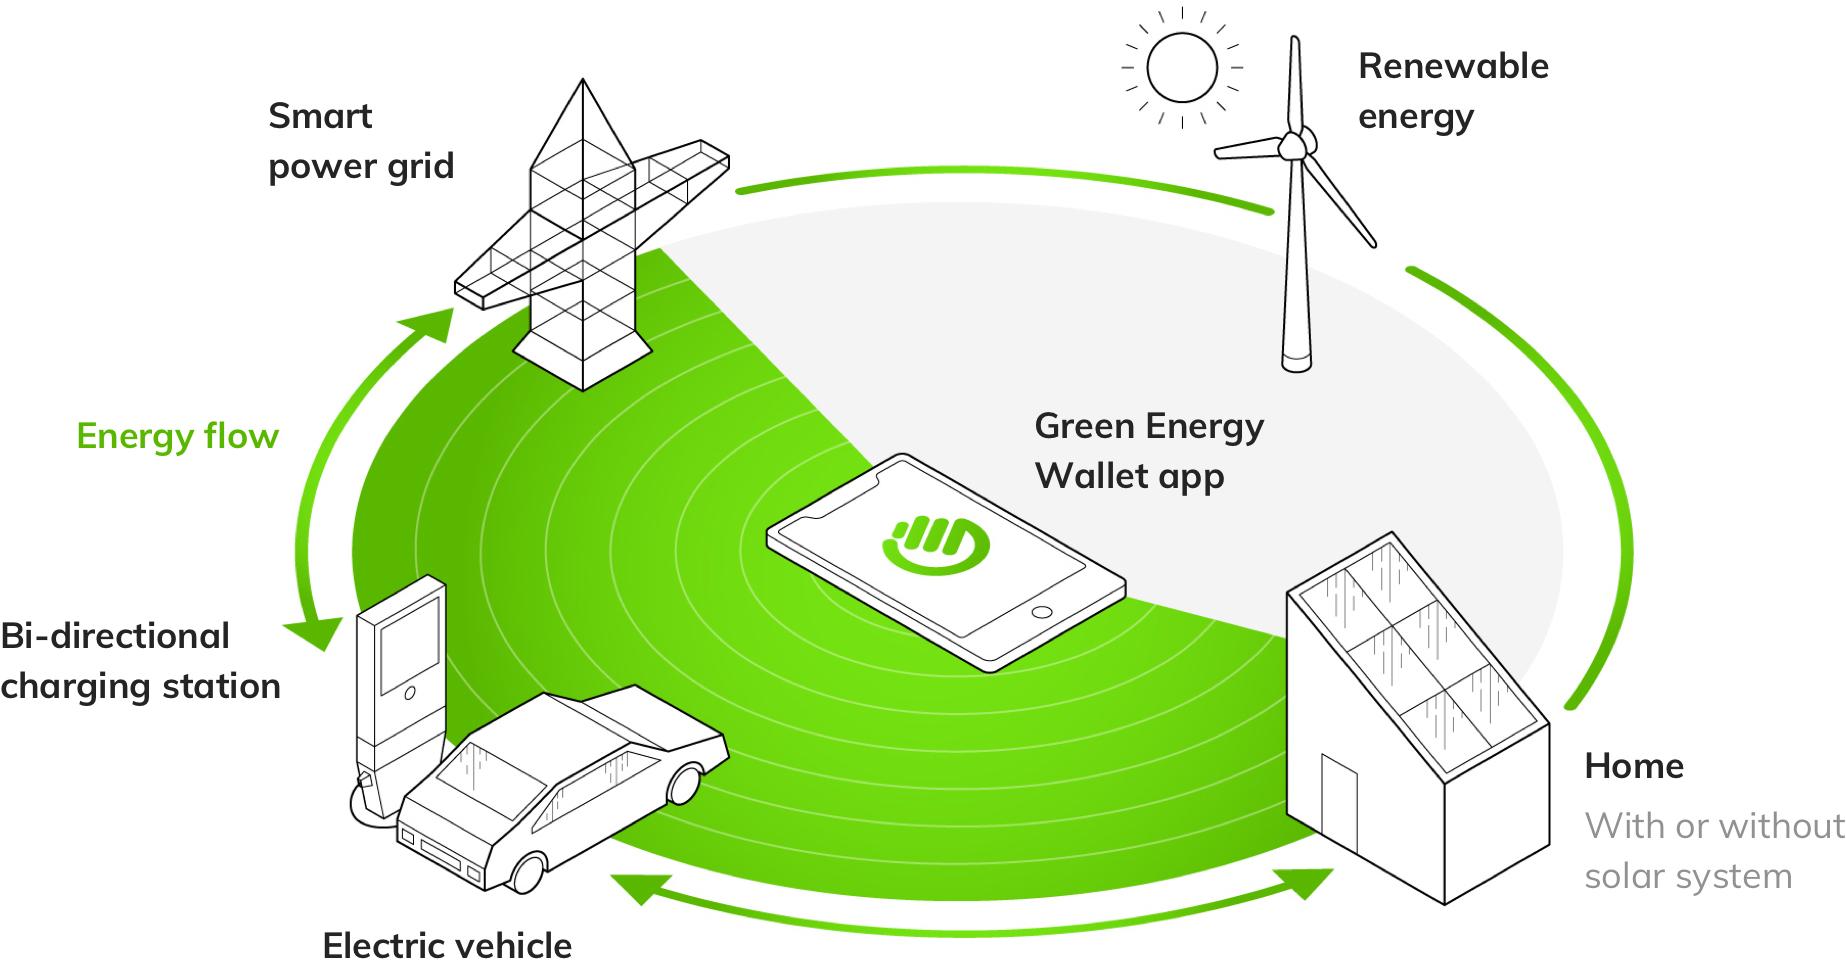 Green Wallet Wind Turbine Energy Flow Diagram Additionally Home Solar Power Scheme Isometric